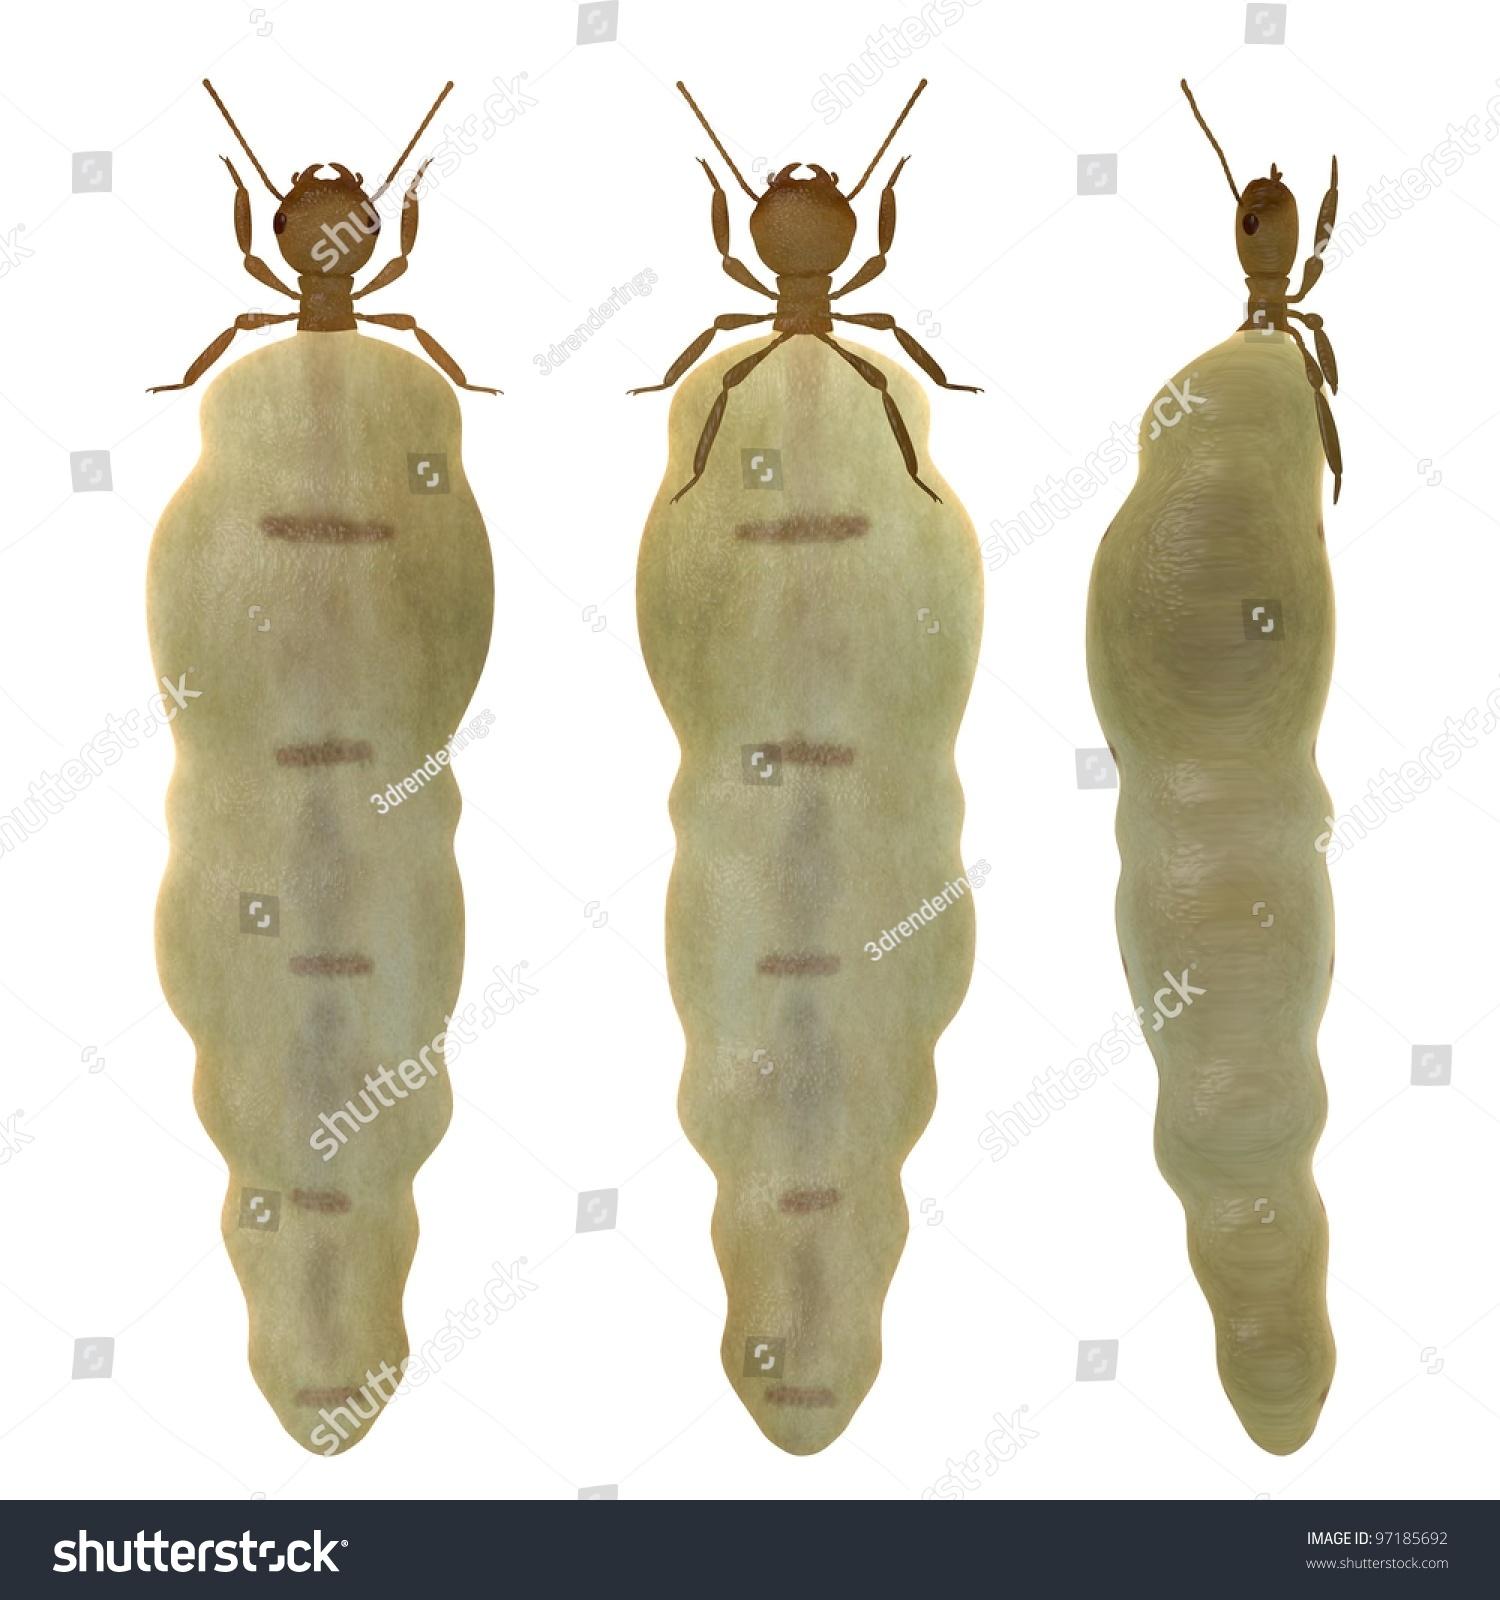 Termite: Termite Queen